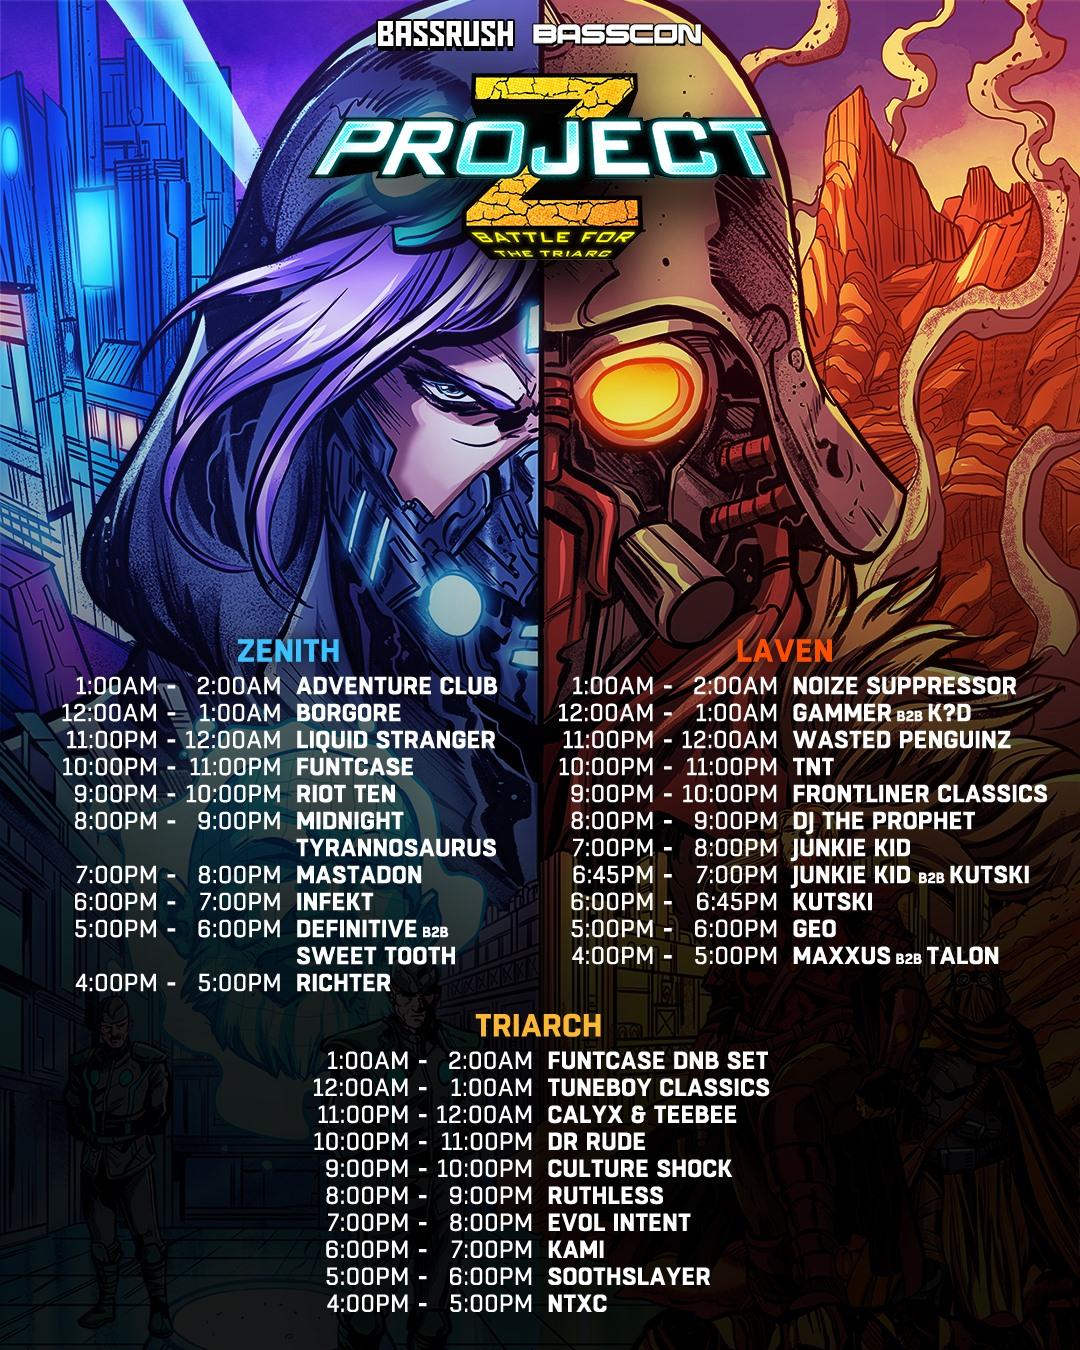 Project Z 2019 Set Times